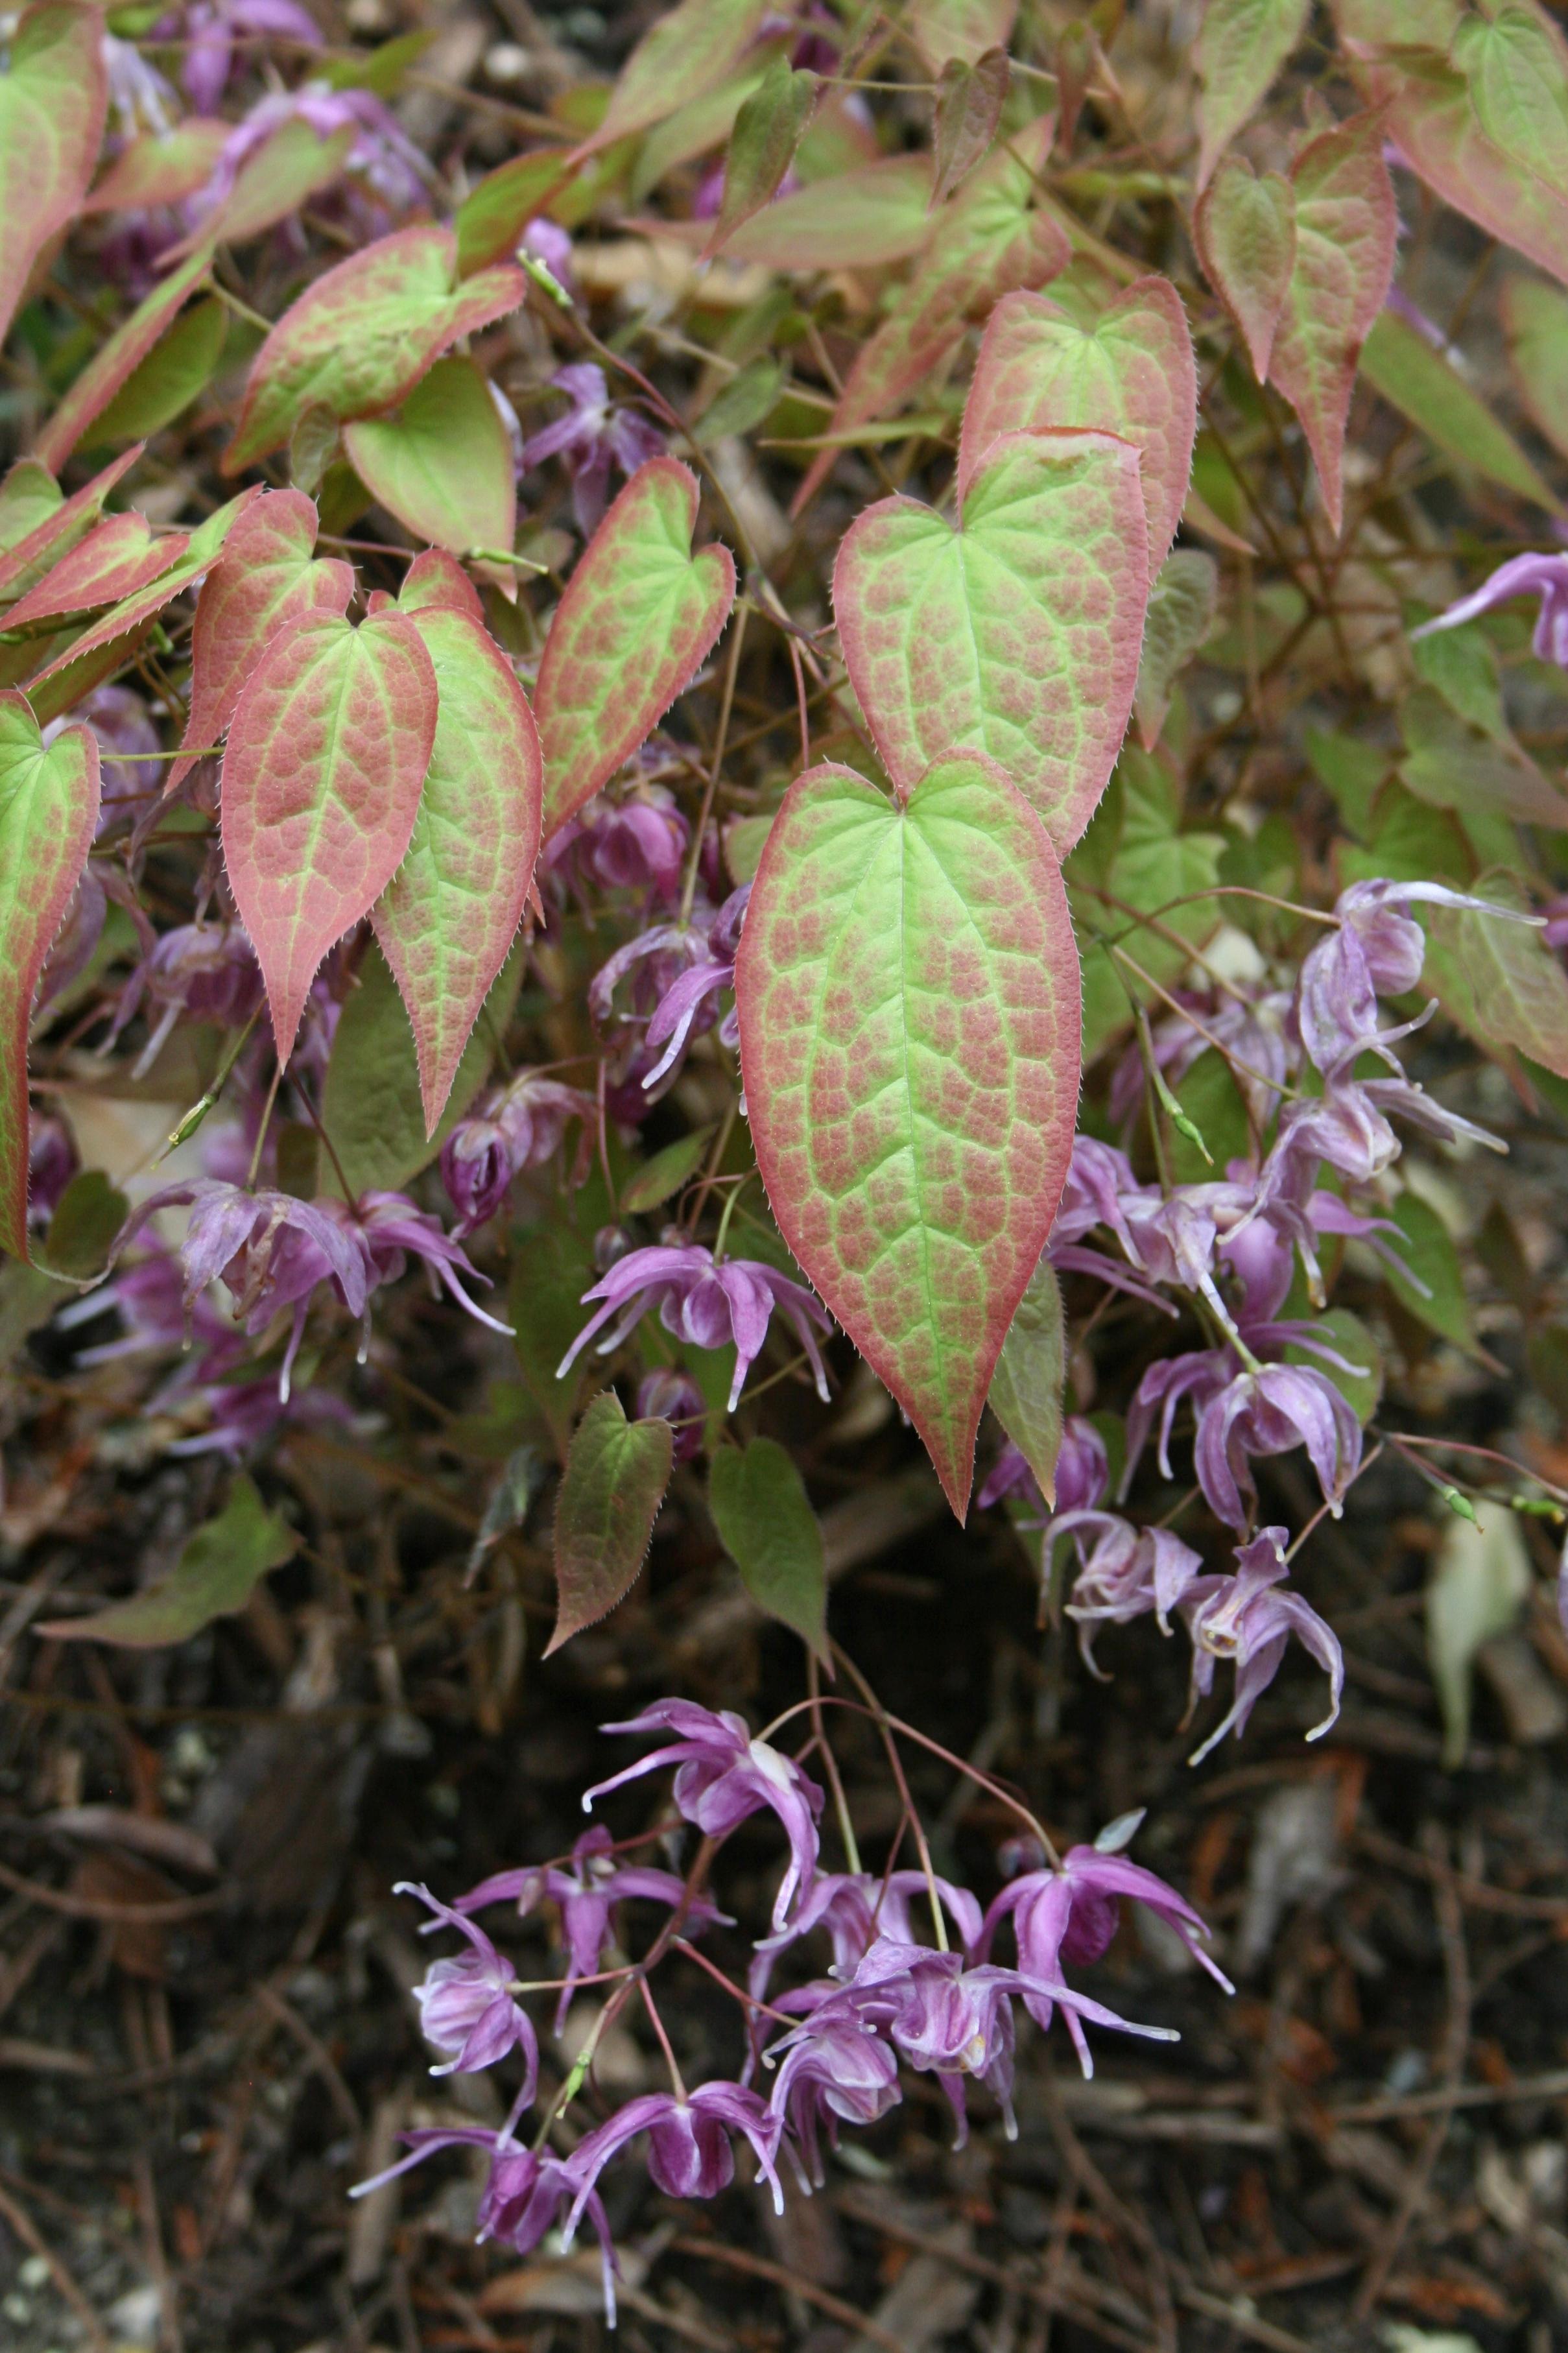 Epimedium sempervirens 'Violet Queen' @ JLBG